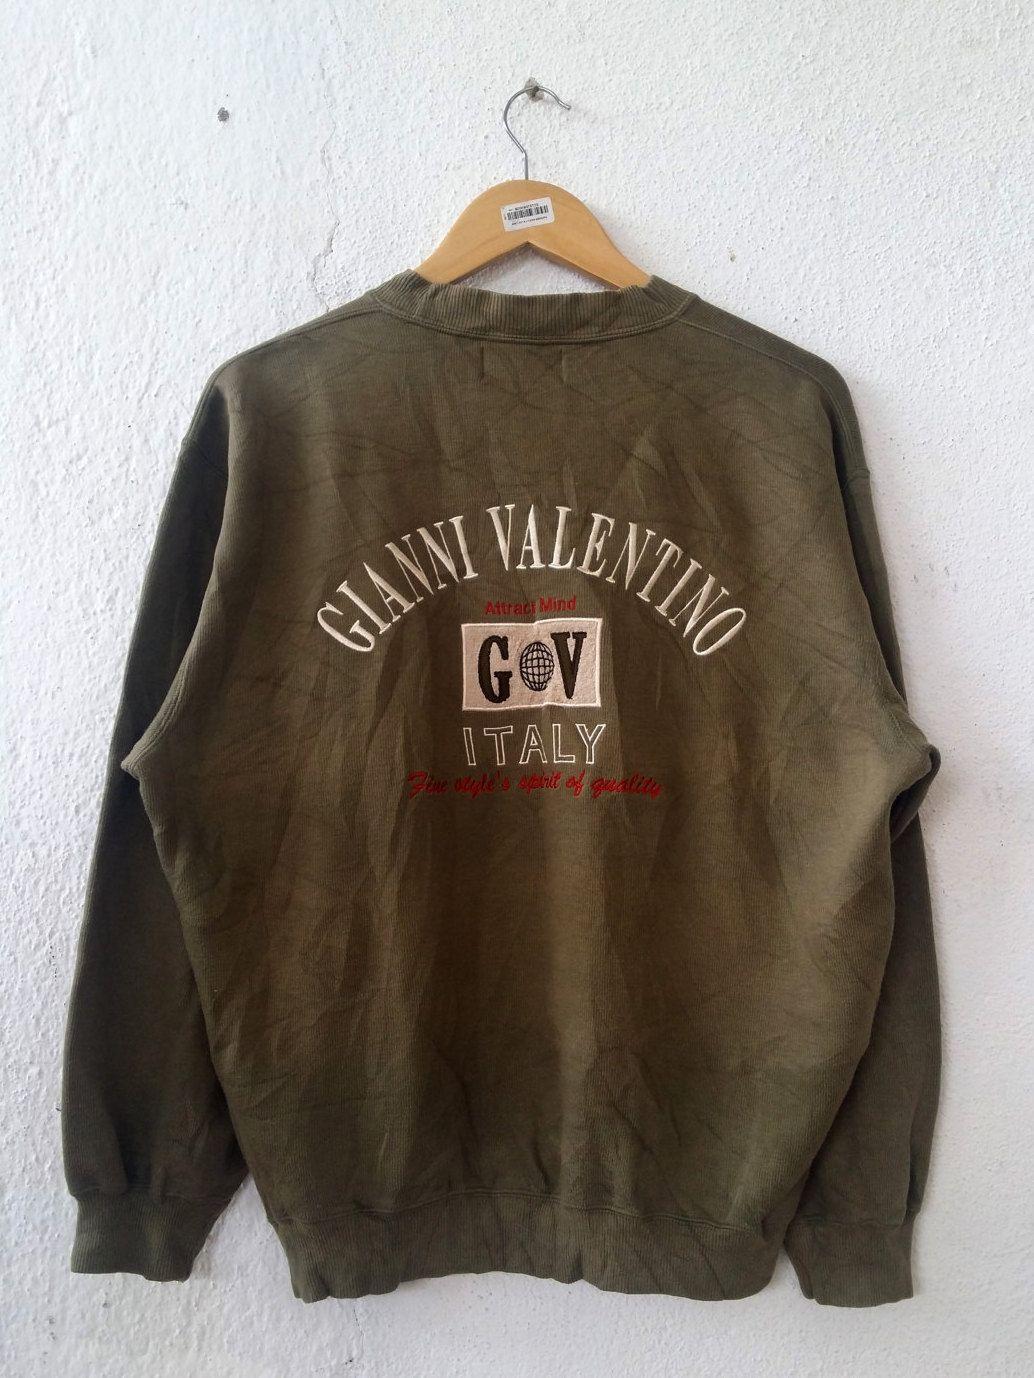 bad5c5c28d8e4 Vintage 90's GIANNI VALENTINO Moda Italiano Sweatshirt With Big ...